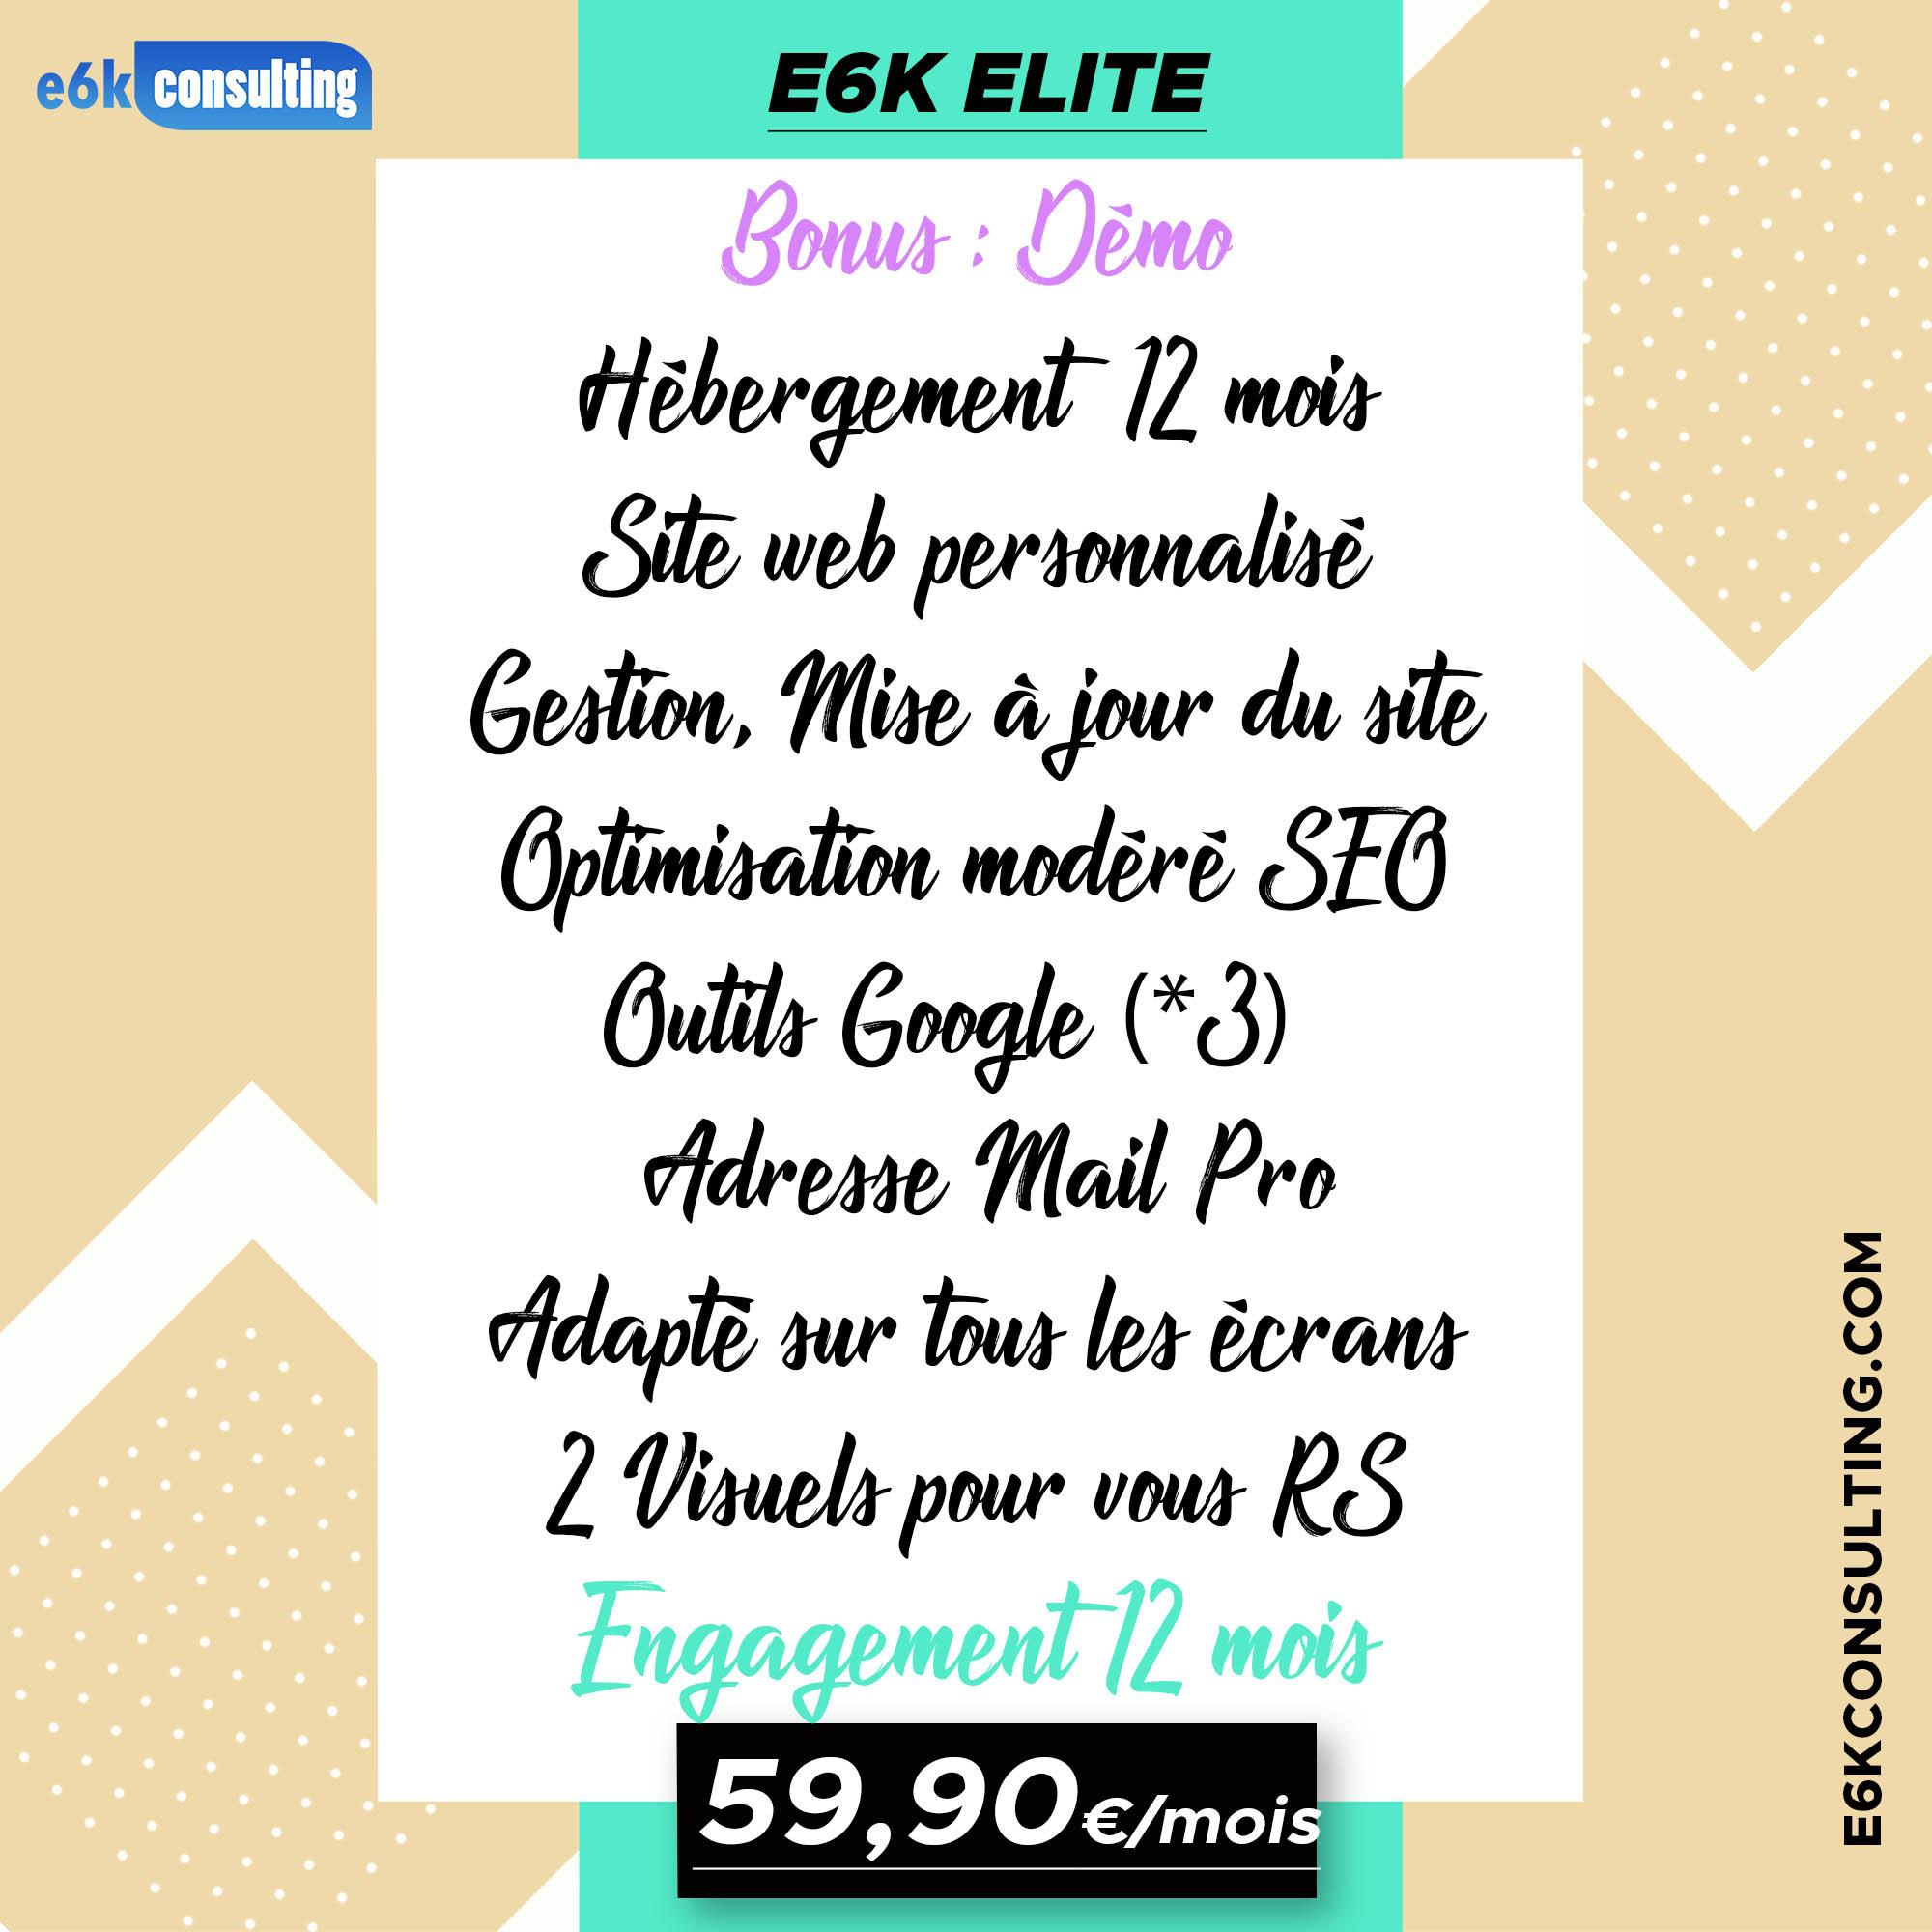 e6kELITE59-e6kconsulting-createur-de-site-web